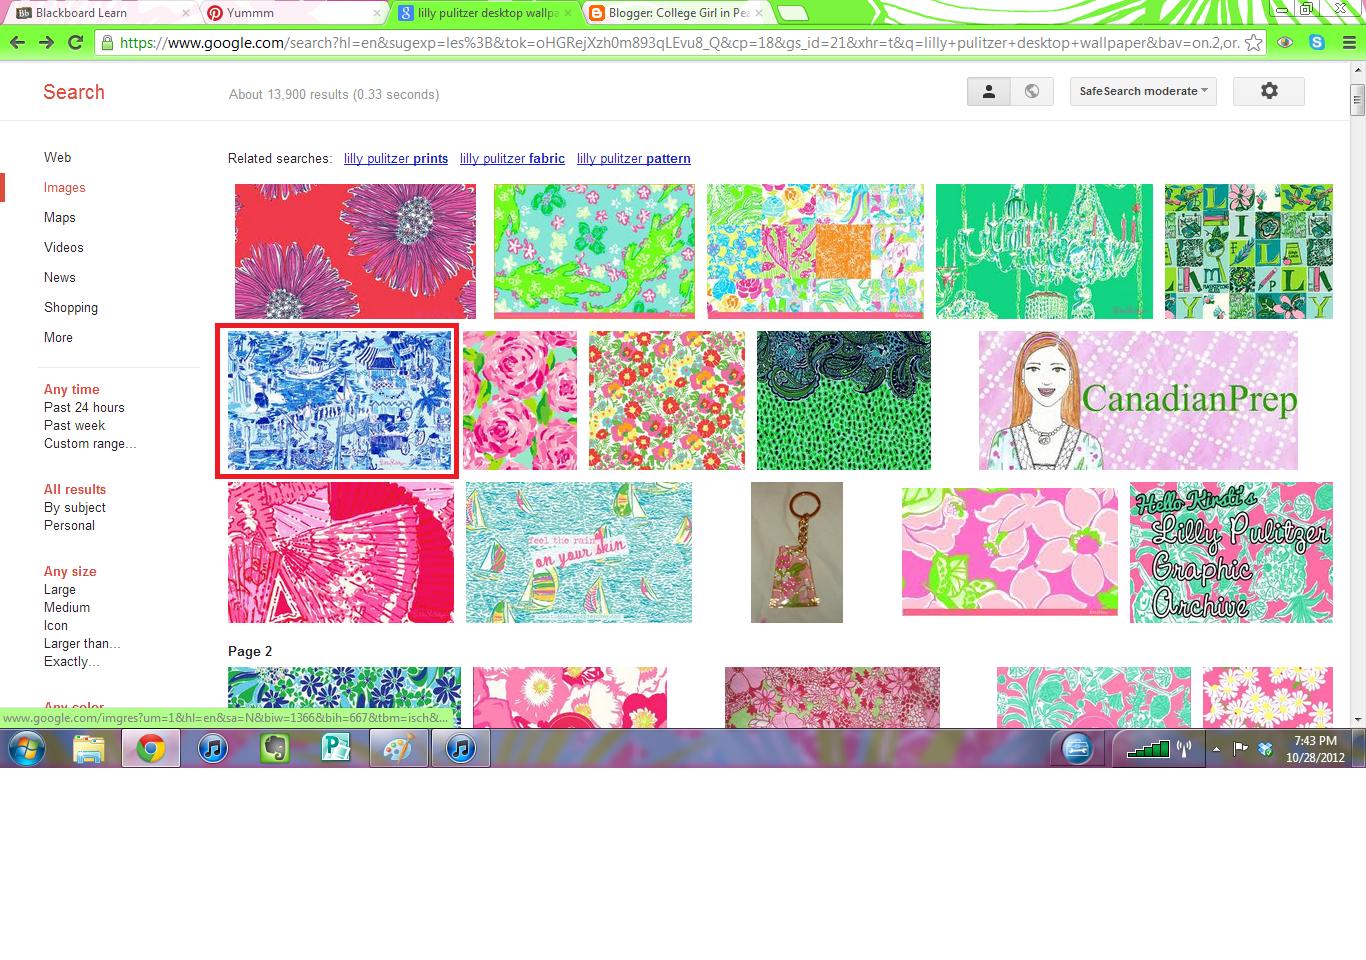 wallpaper free monogram desktop - photo #13